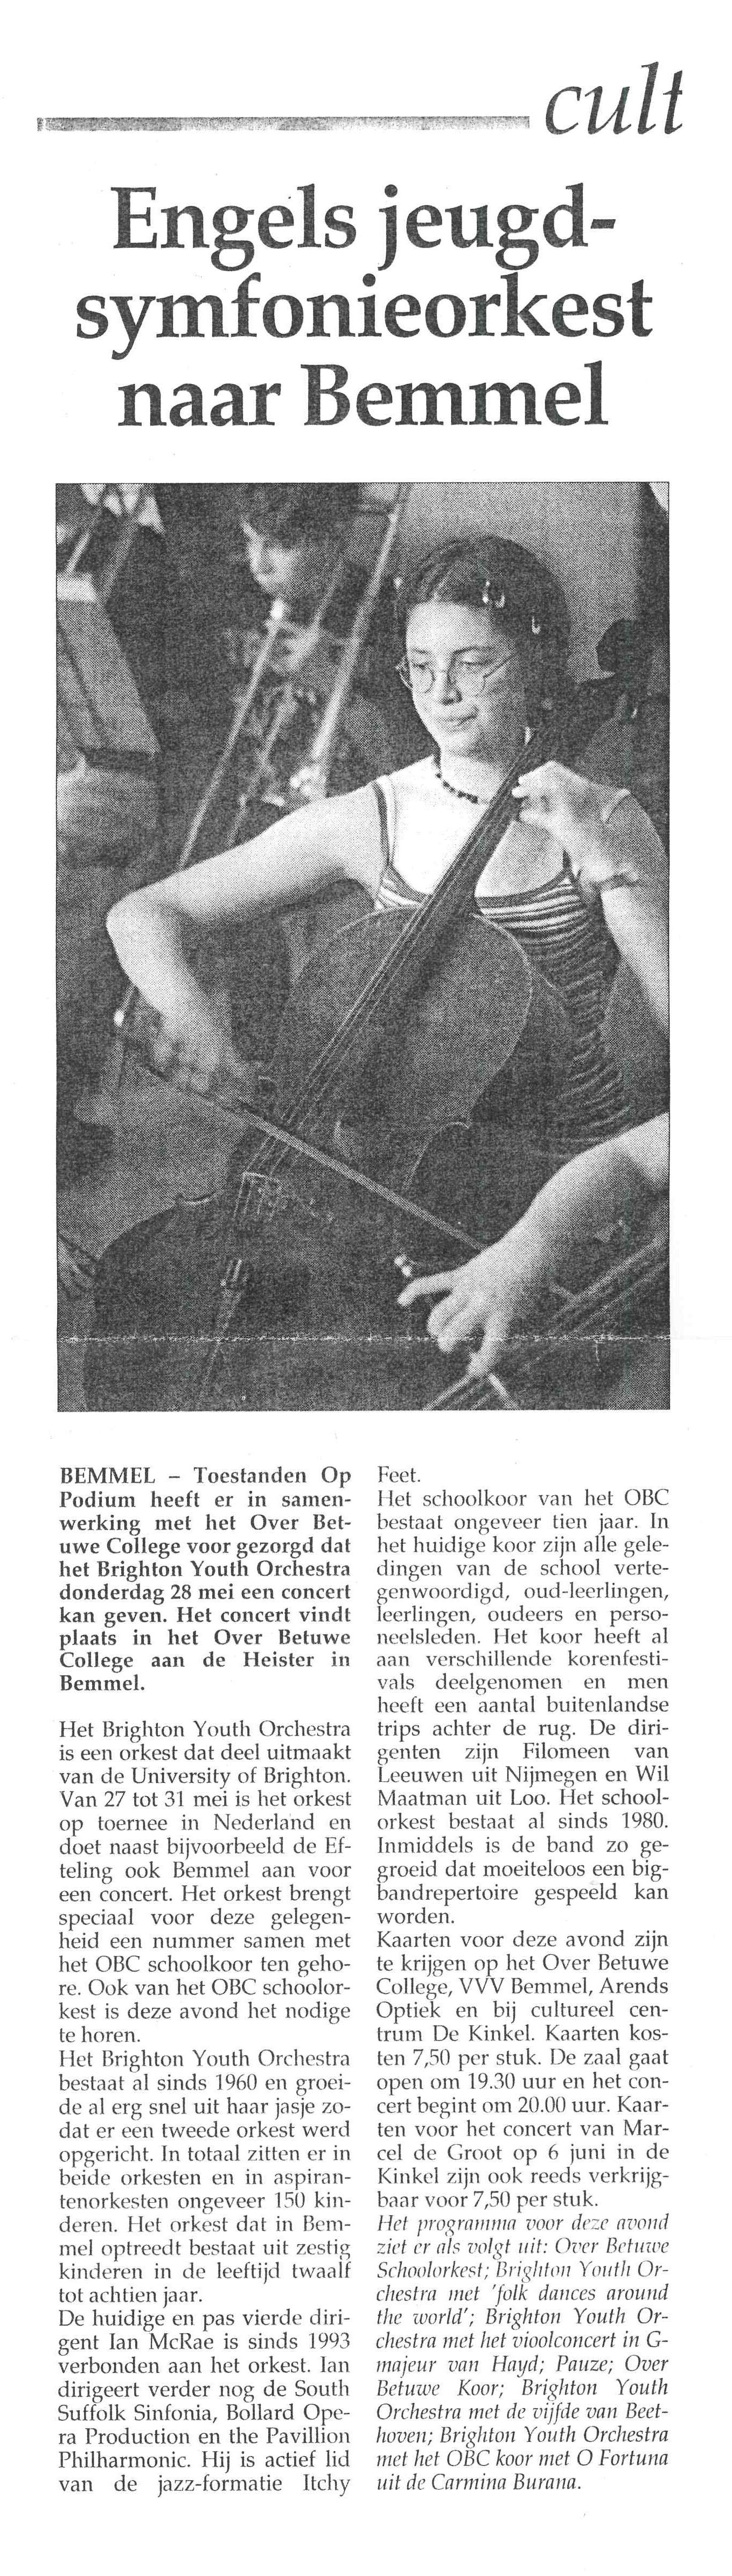 00304-Bemmel Cult (1995).jpg